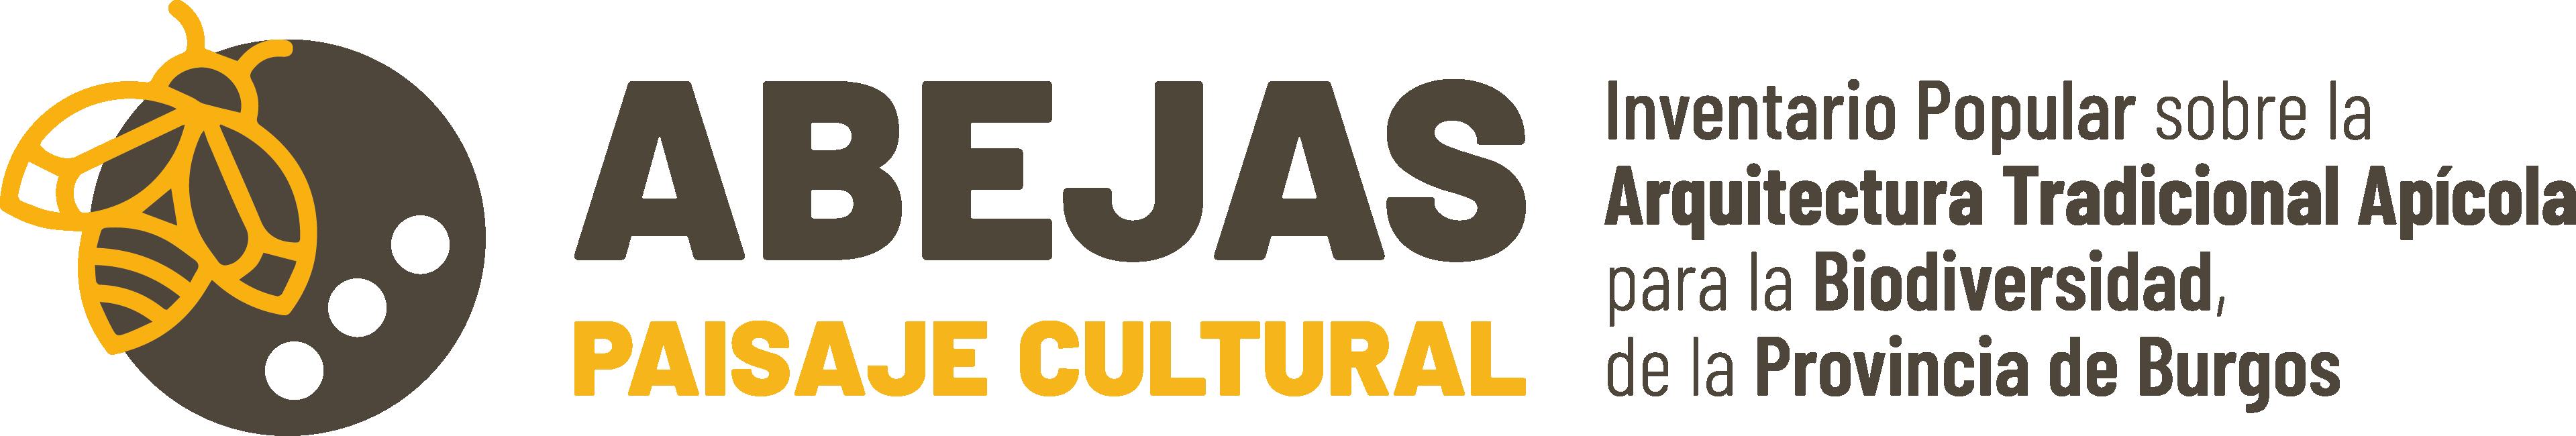 ABEJAS paisaje cultural